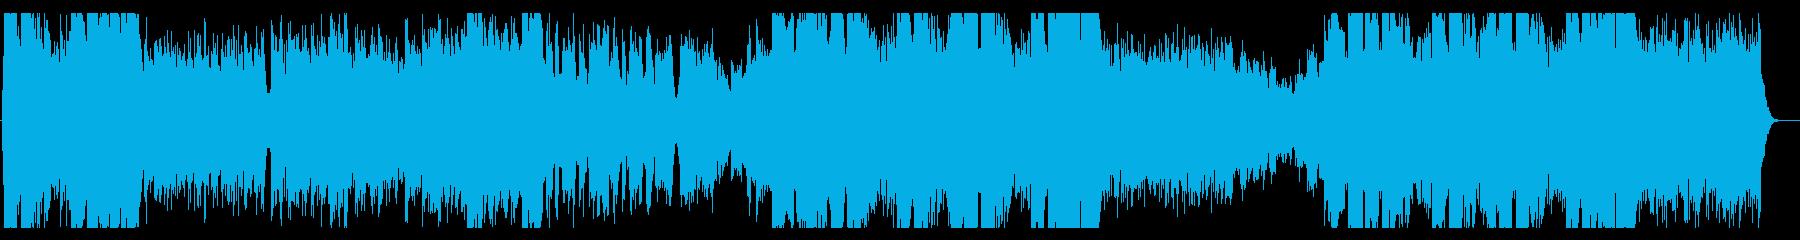 【YouTube】華やかな和風ロックの再生済みの波形